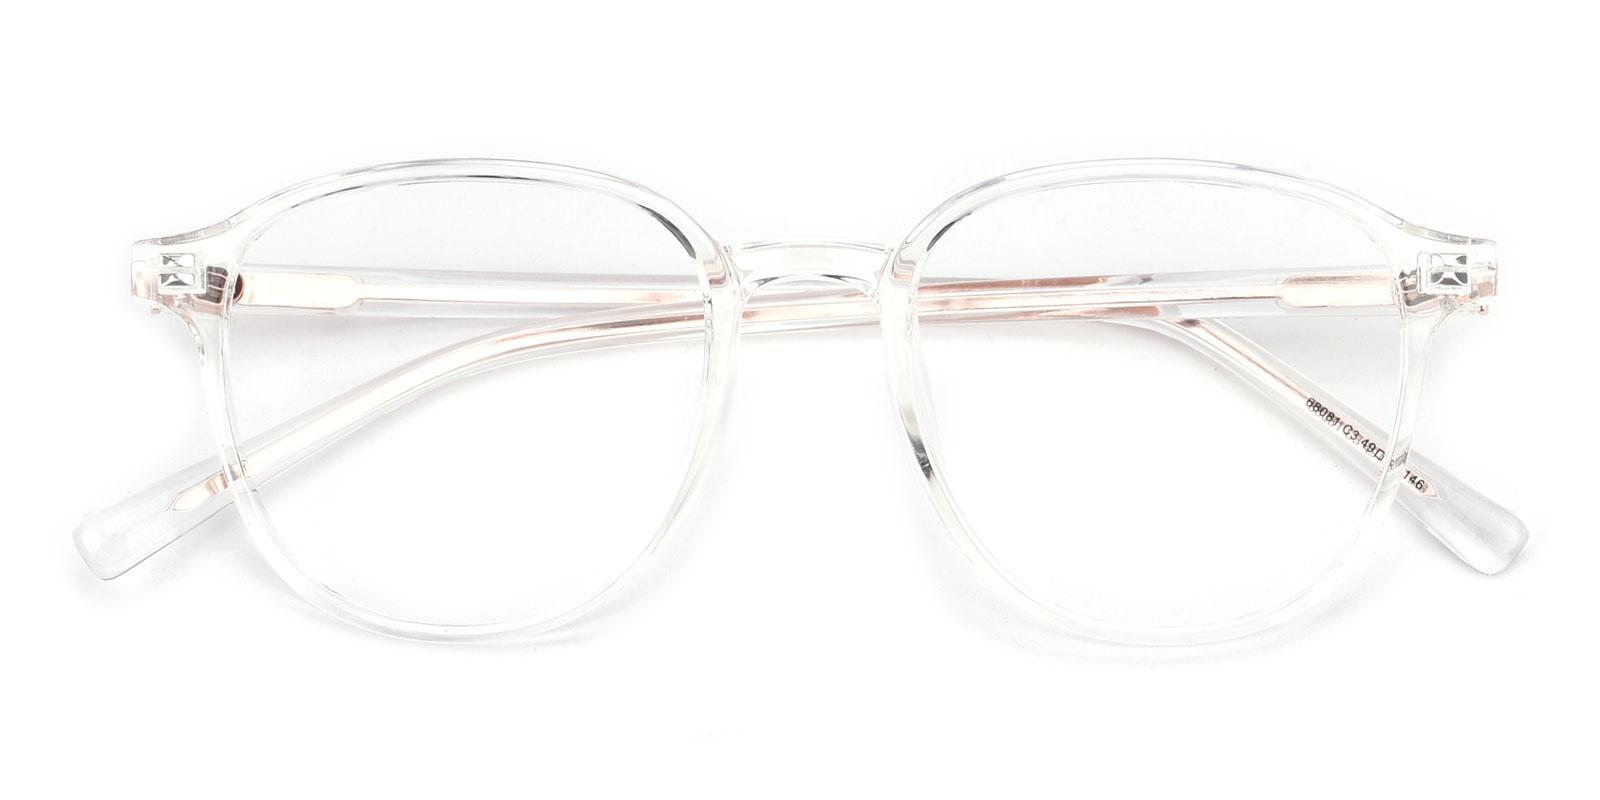 Mamo-Translucent-Square-TR-Eyeglasses-detail